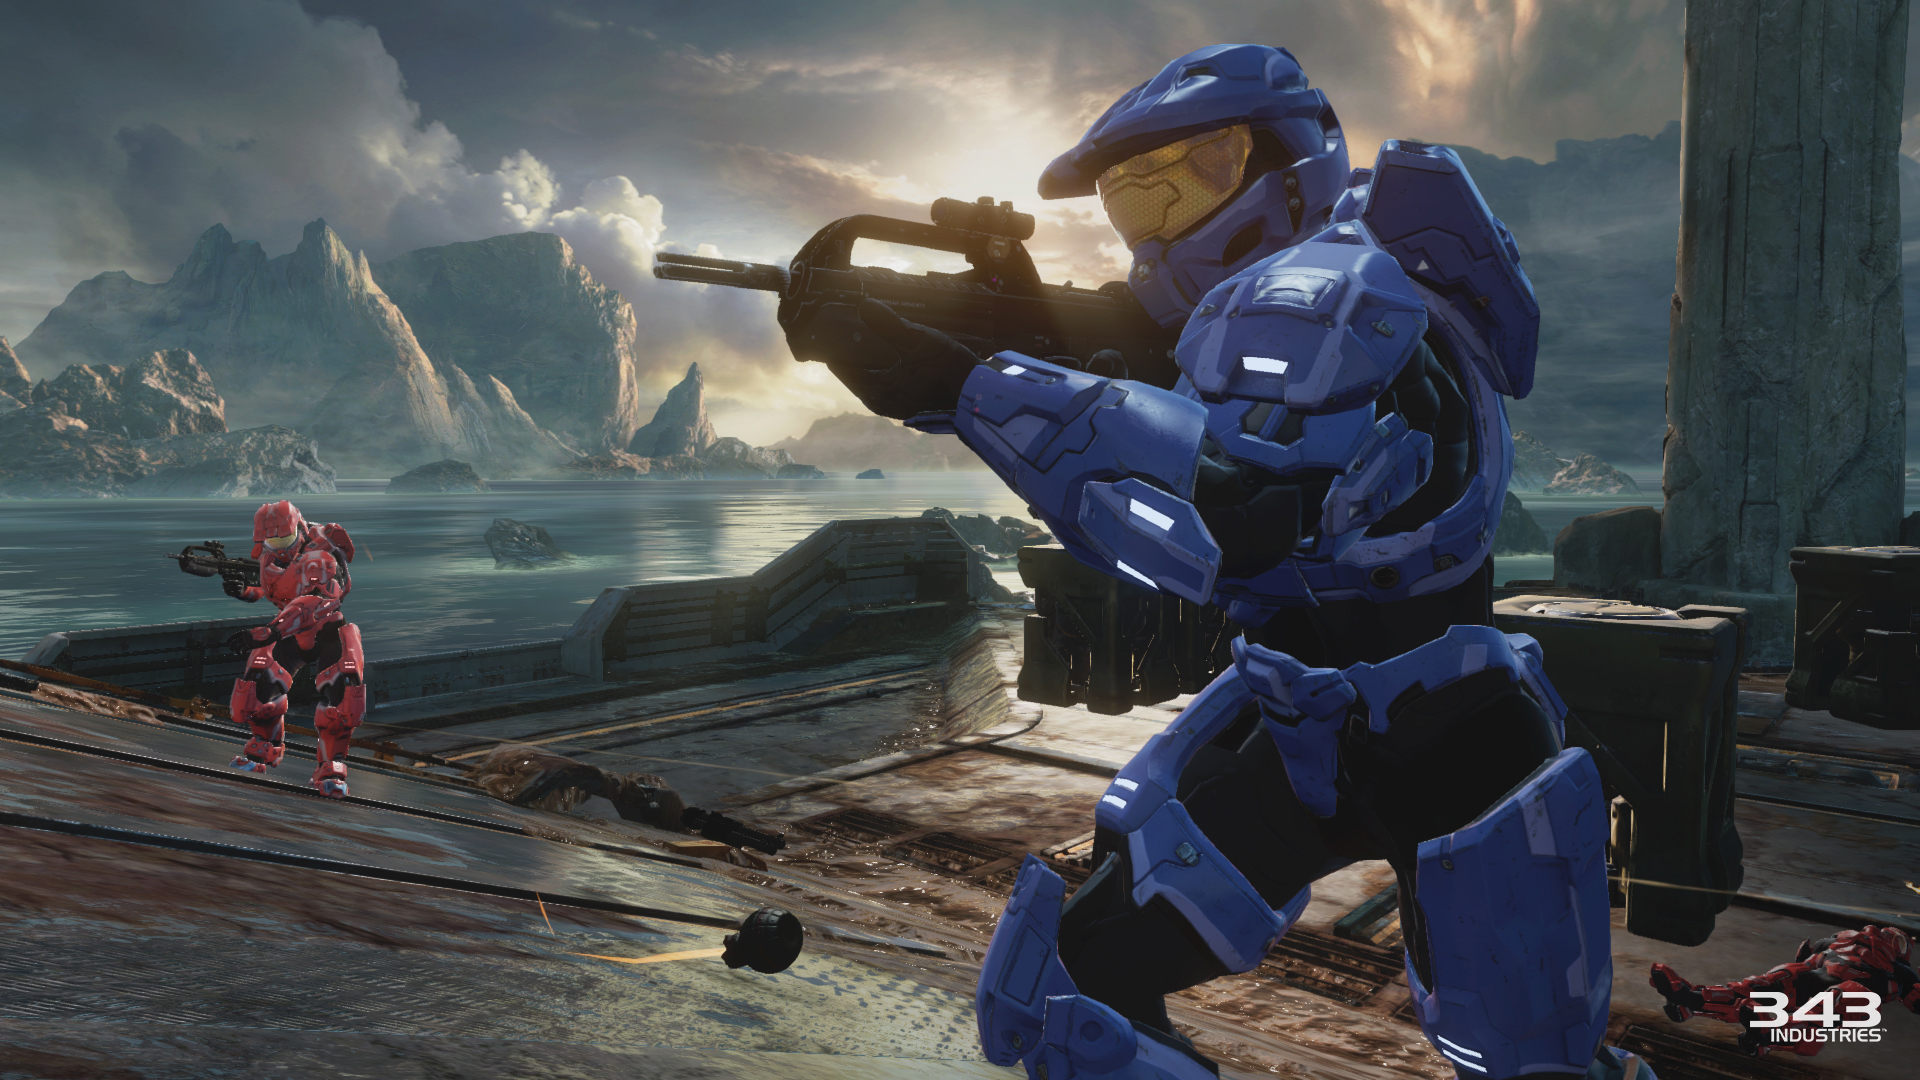 Vyšla kampaň Halo 3: ODST do Halo: The Master Chief Collection 109411